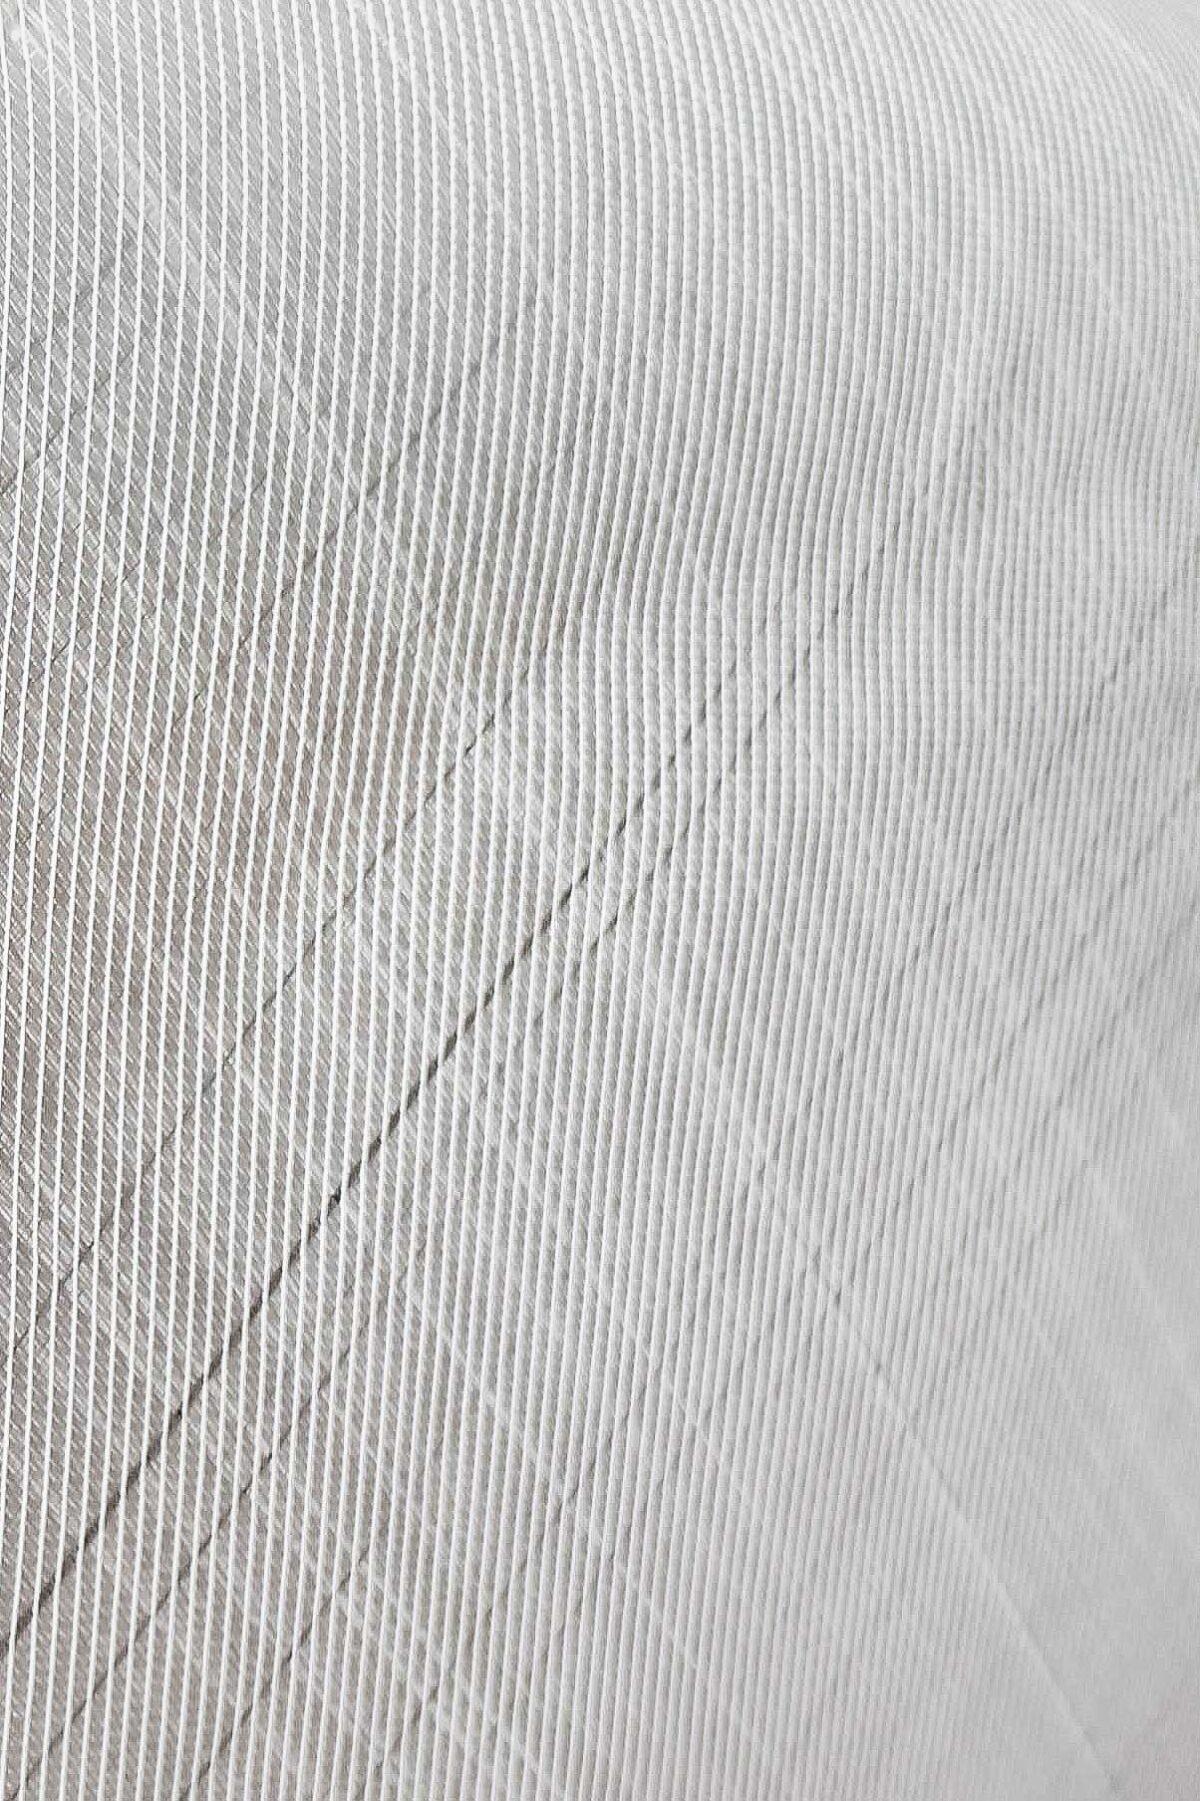 Tissu en fibres de verre bi-axial 300g/m²